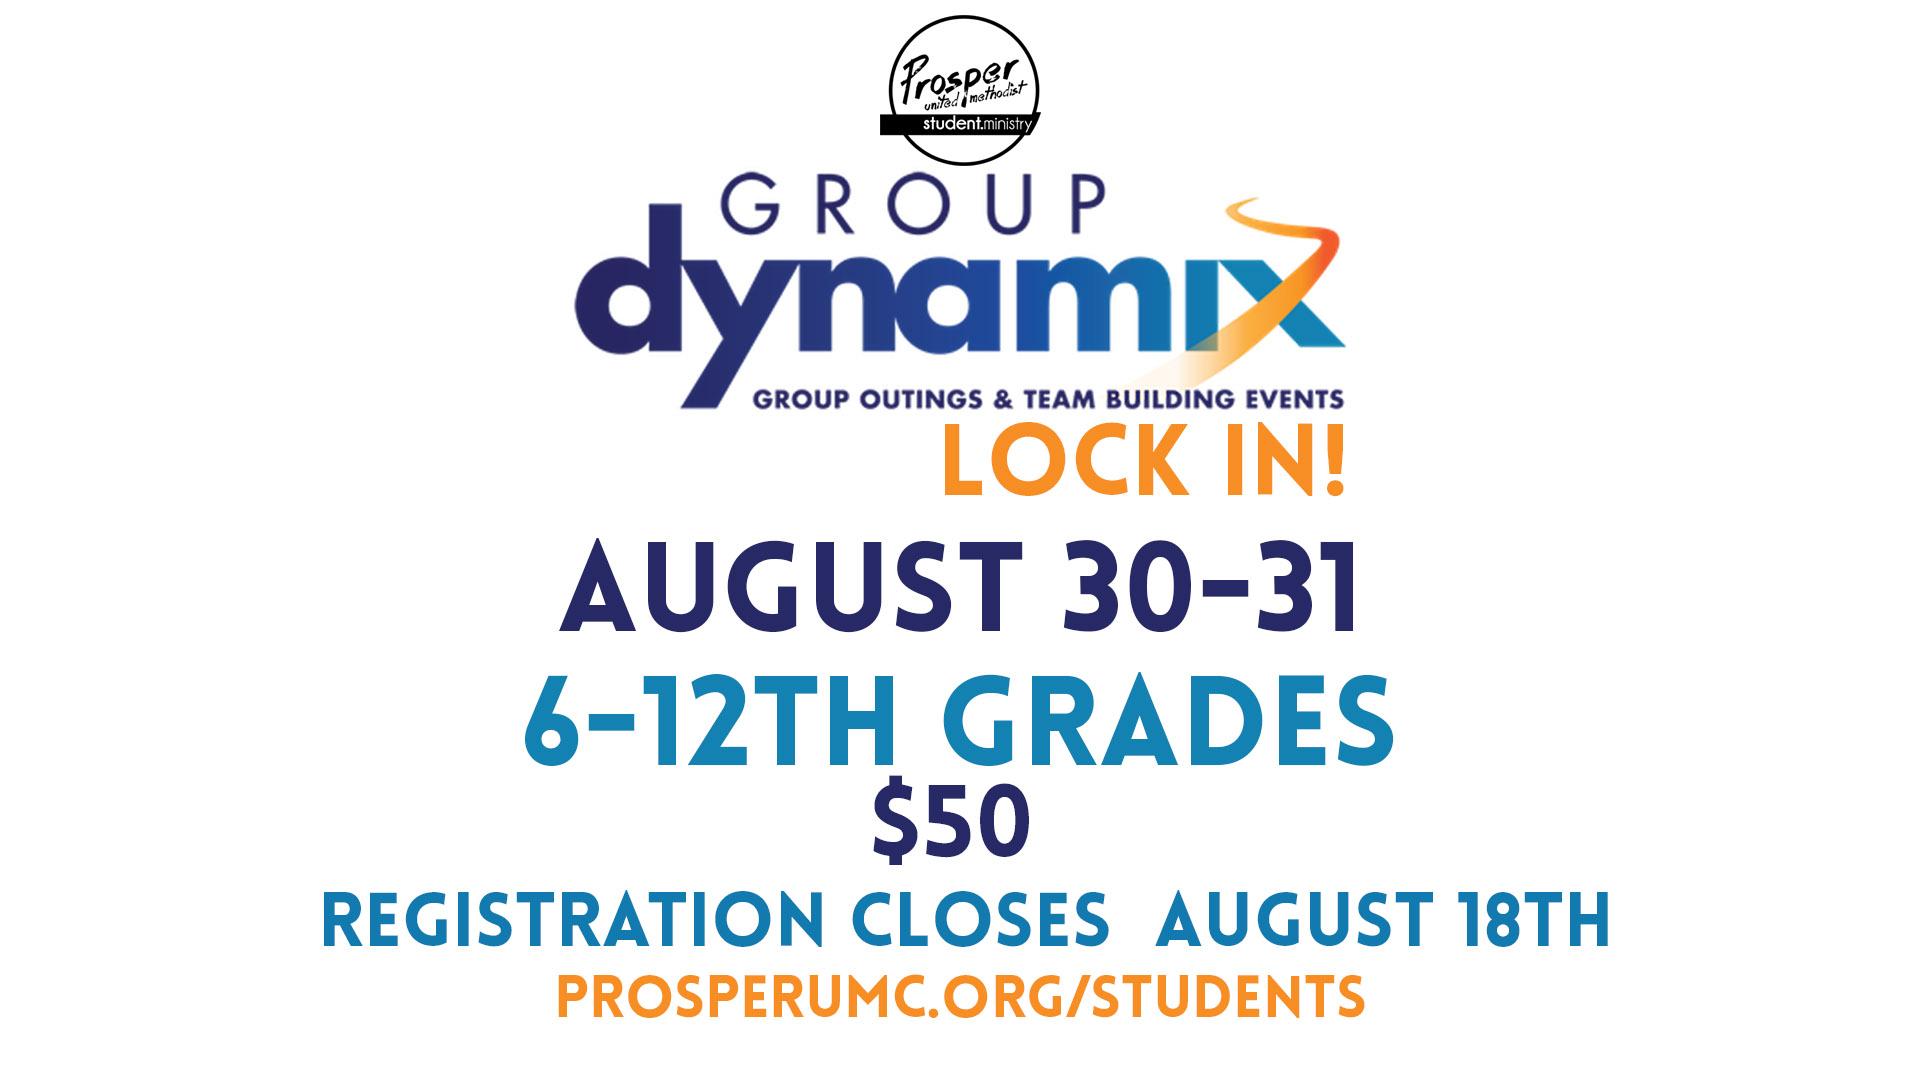 group dynamix.jpg